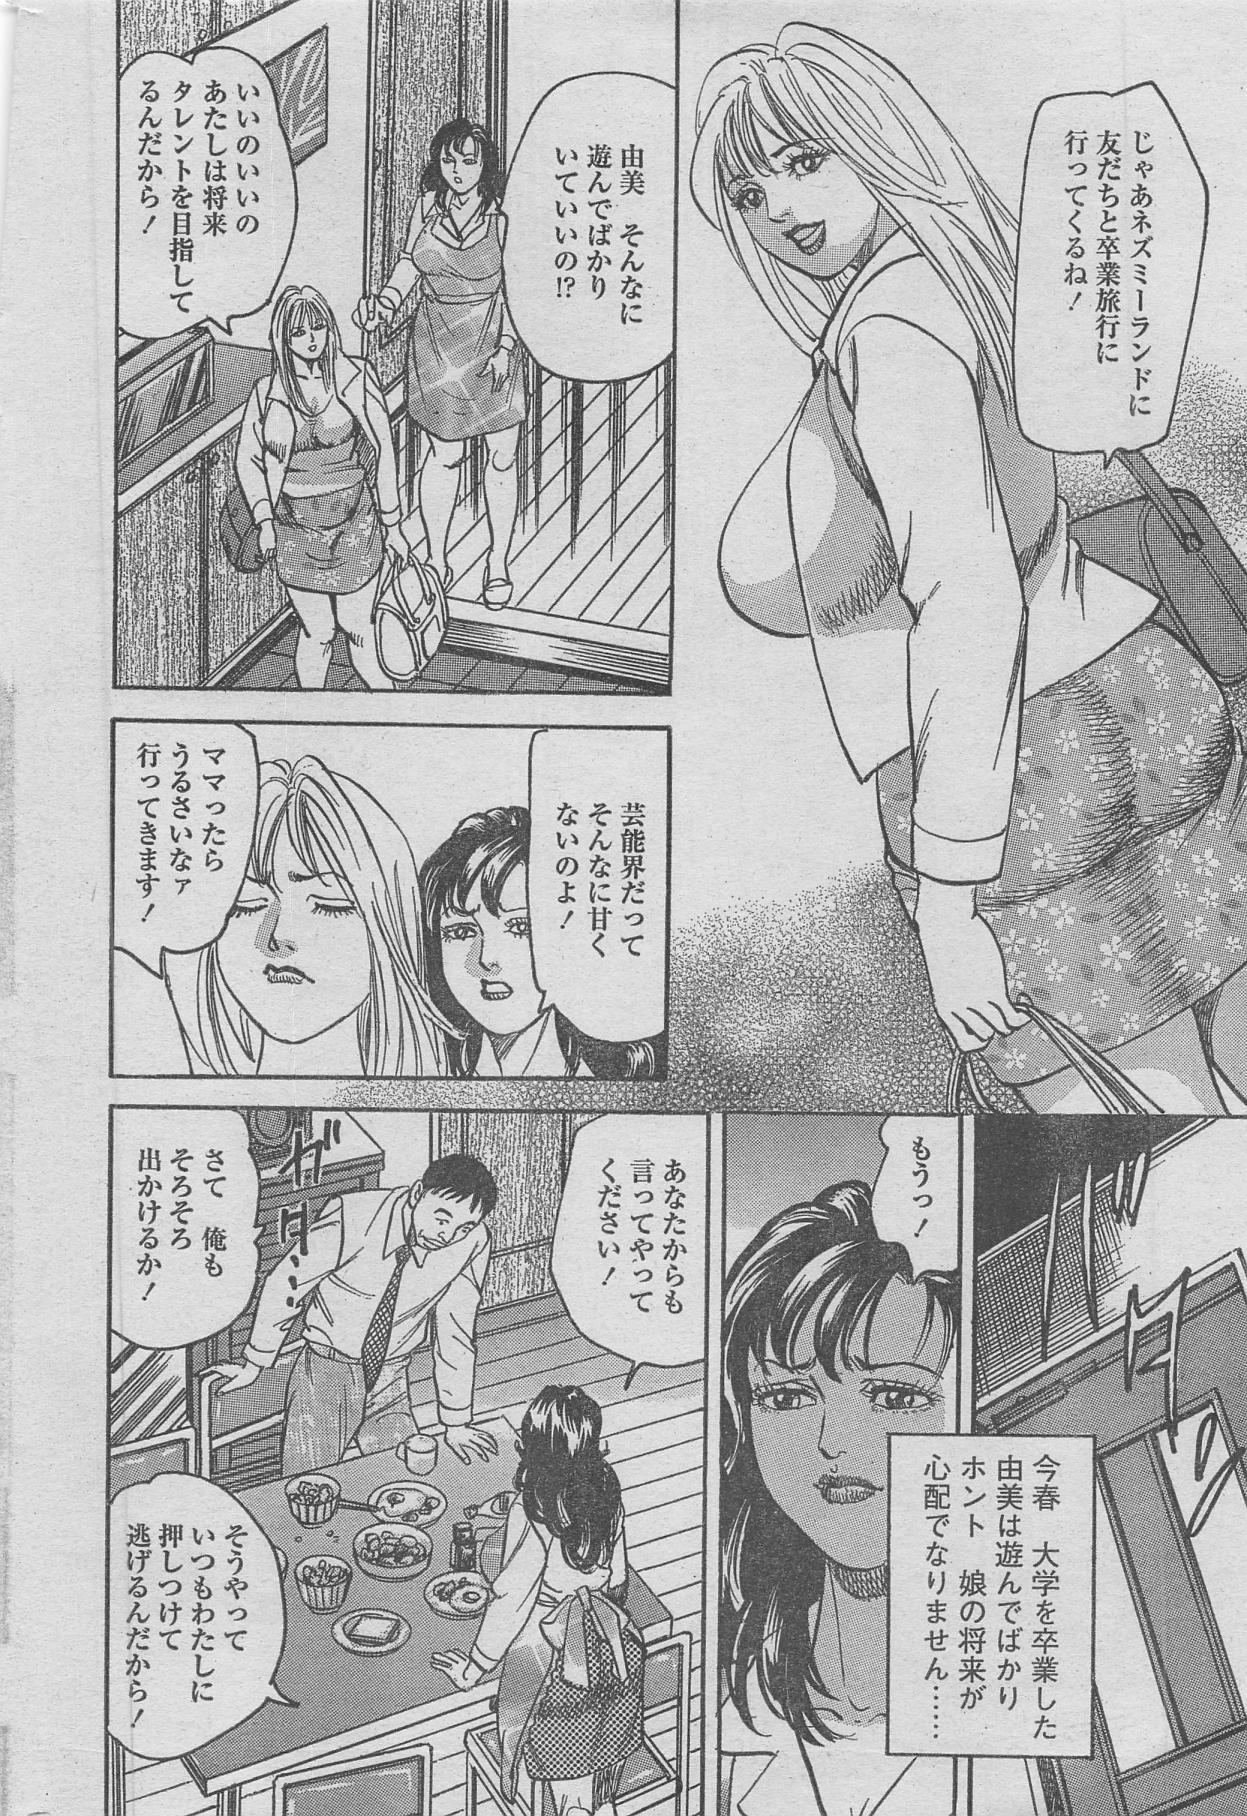 Manga Lawrence 2013-04 25